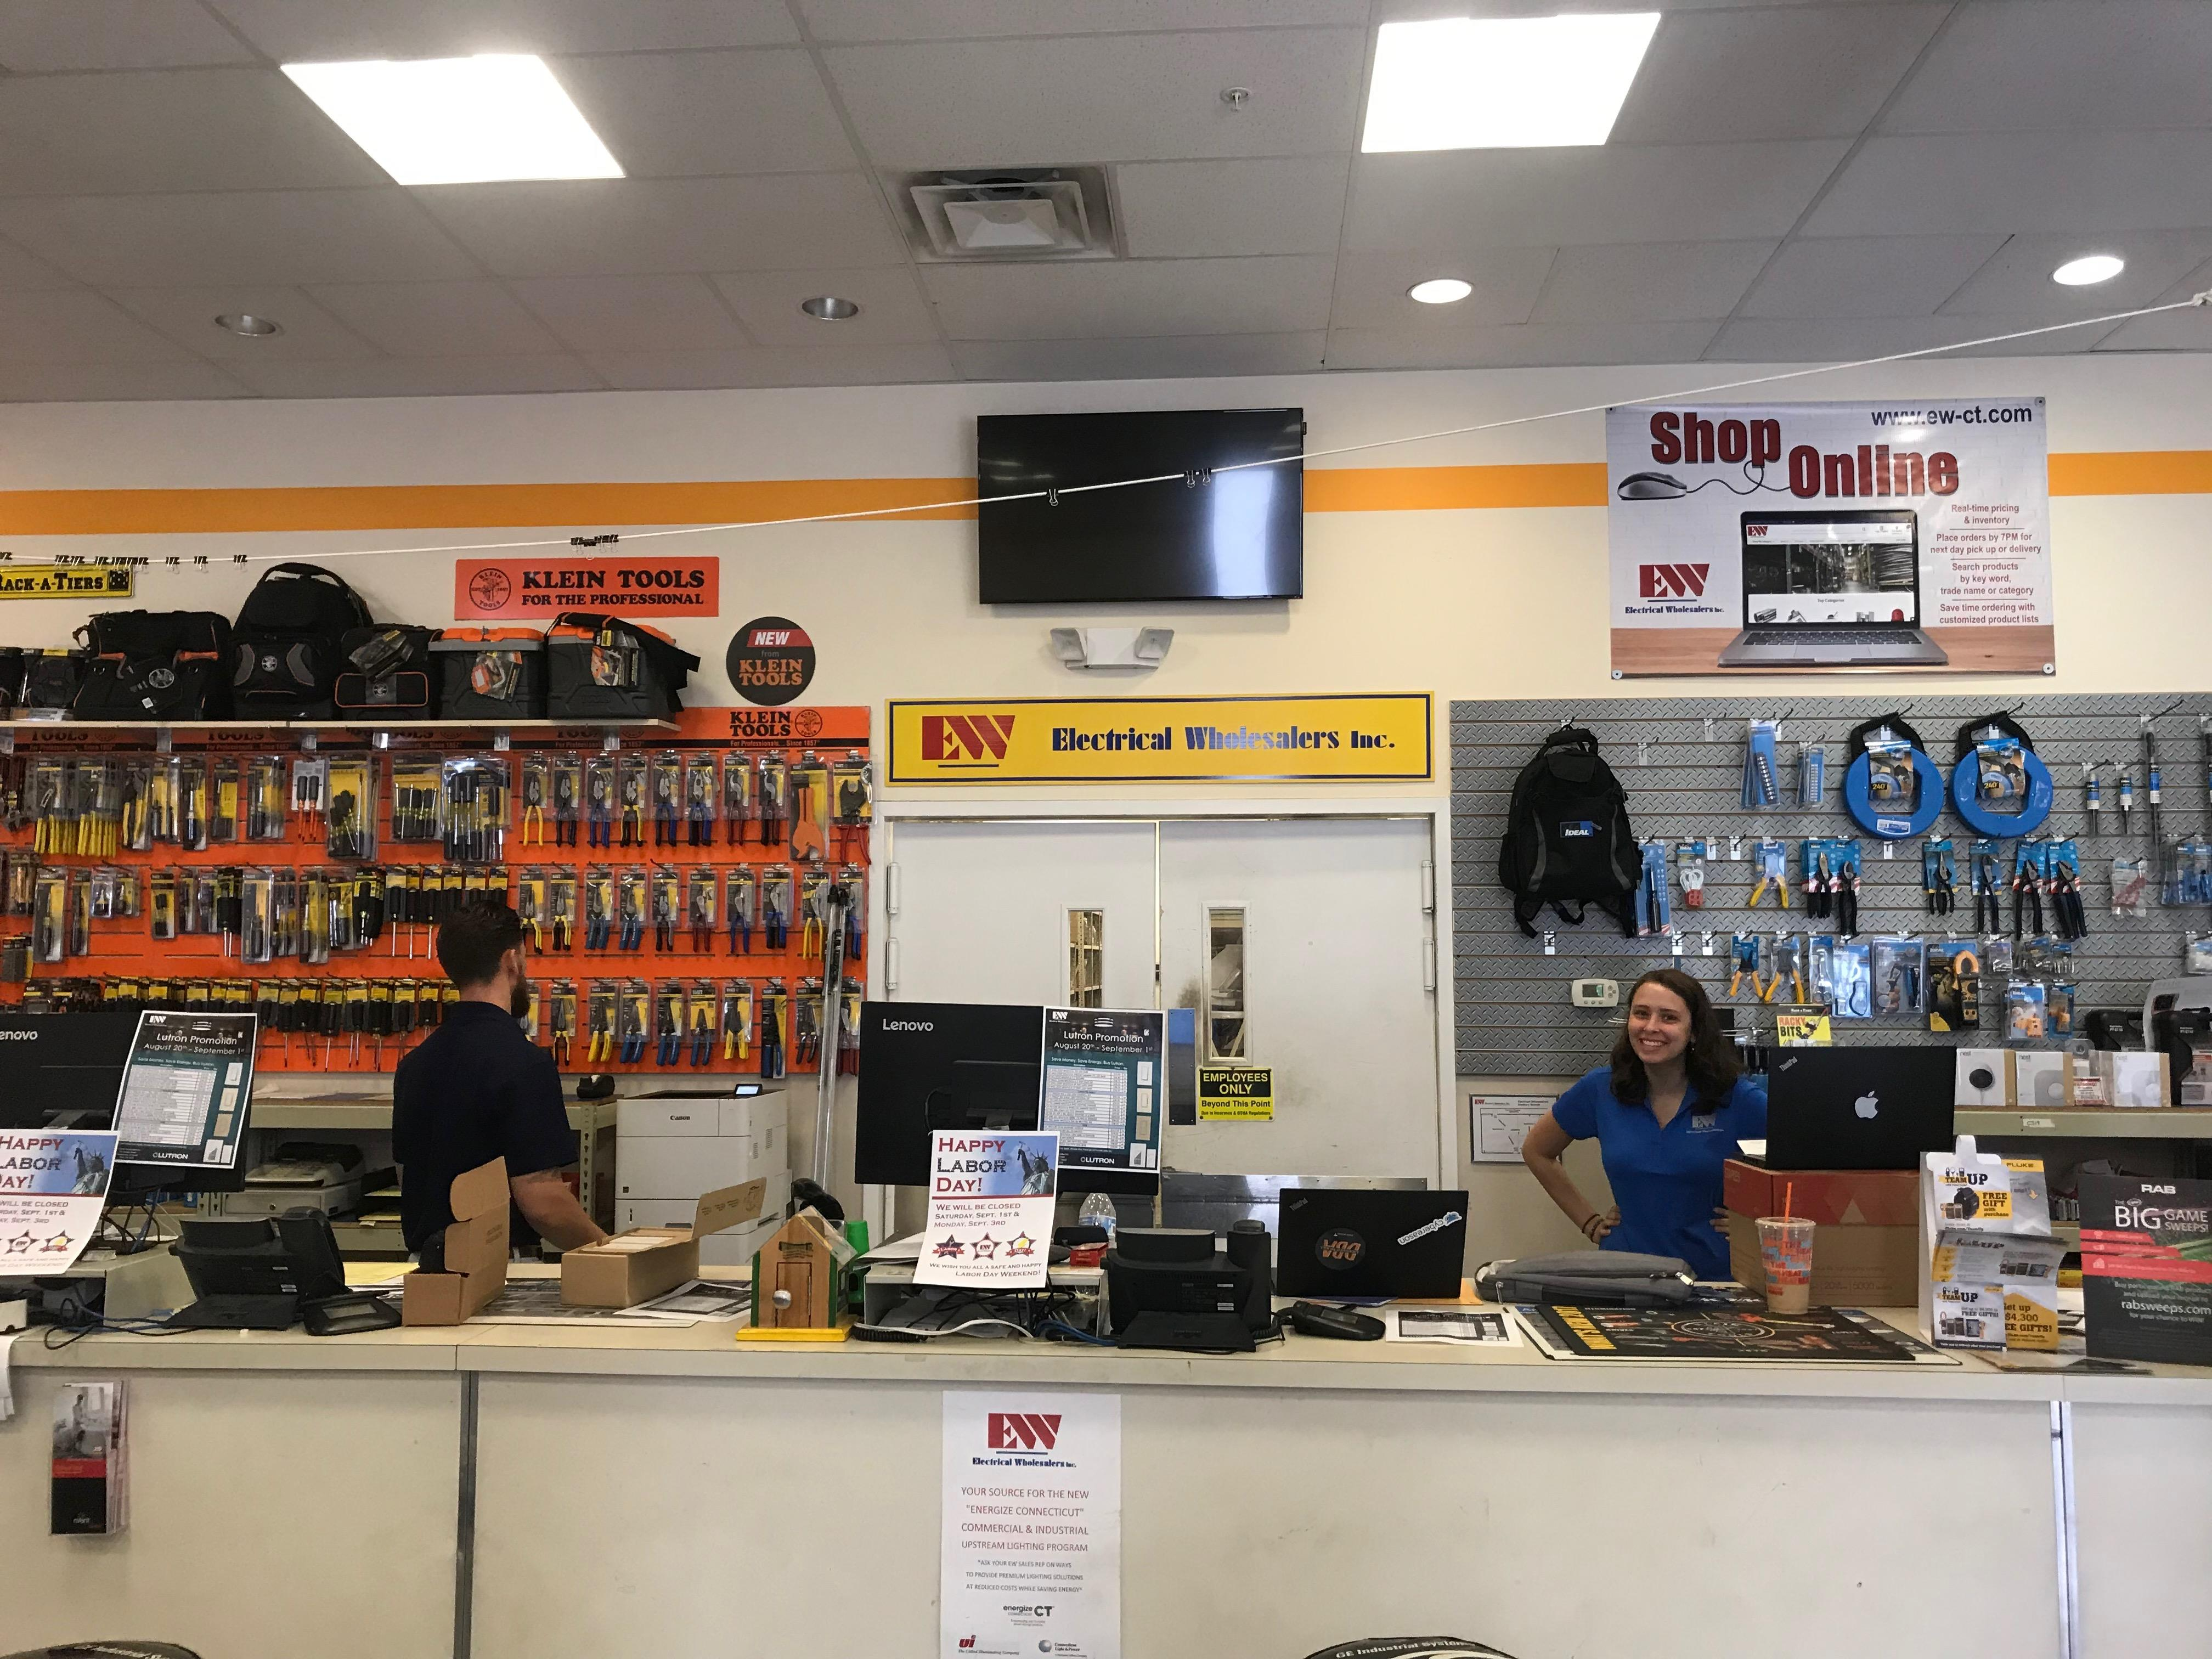 Electrical Wholesalers Inc. image 2